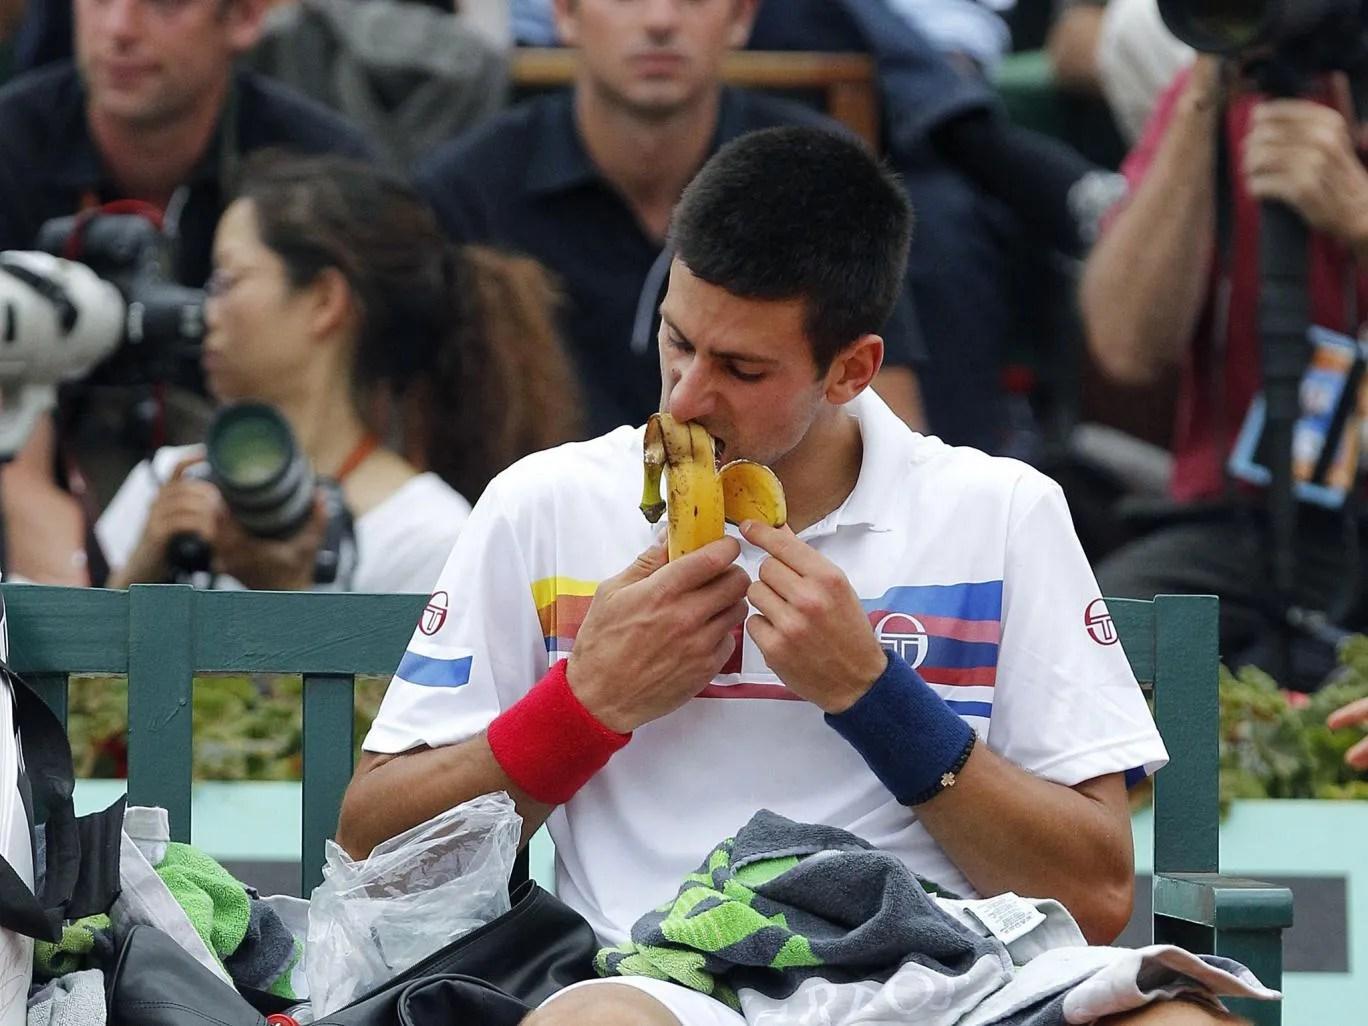 Novak Djokovic tucks into a healthy banana during a break between games